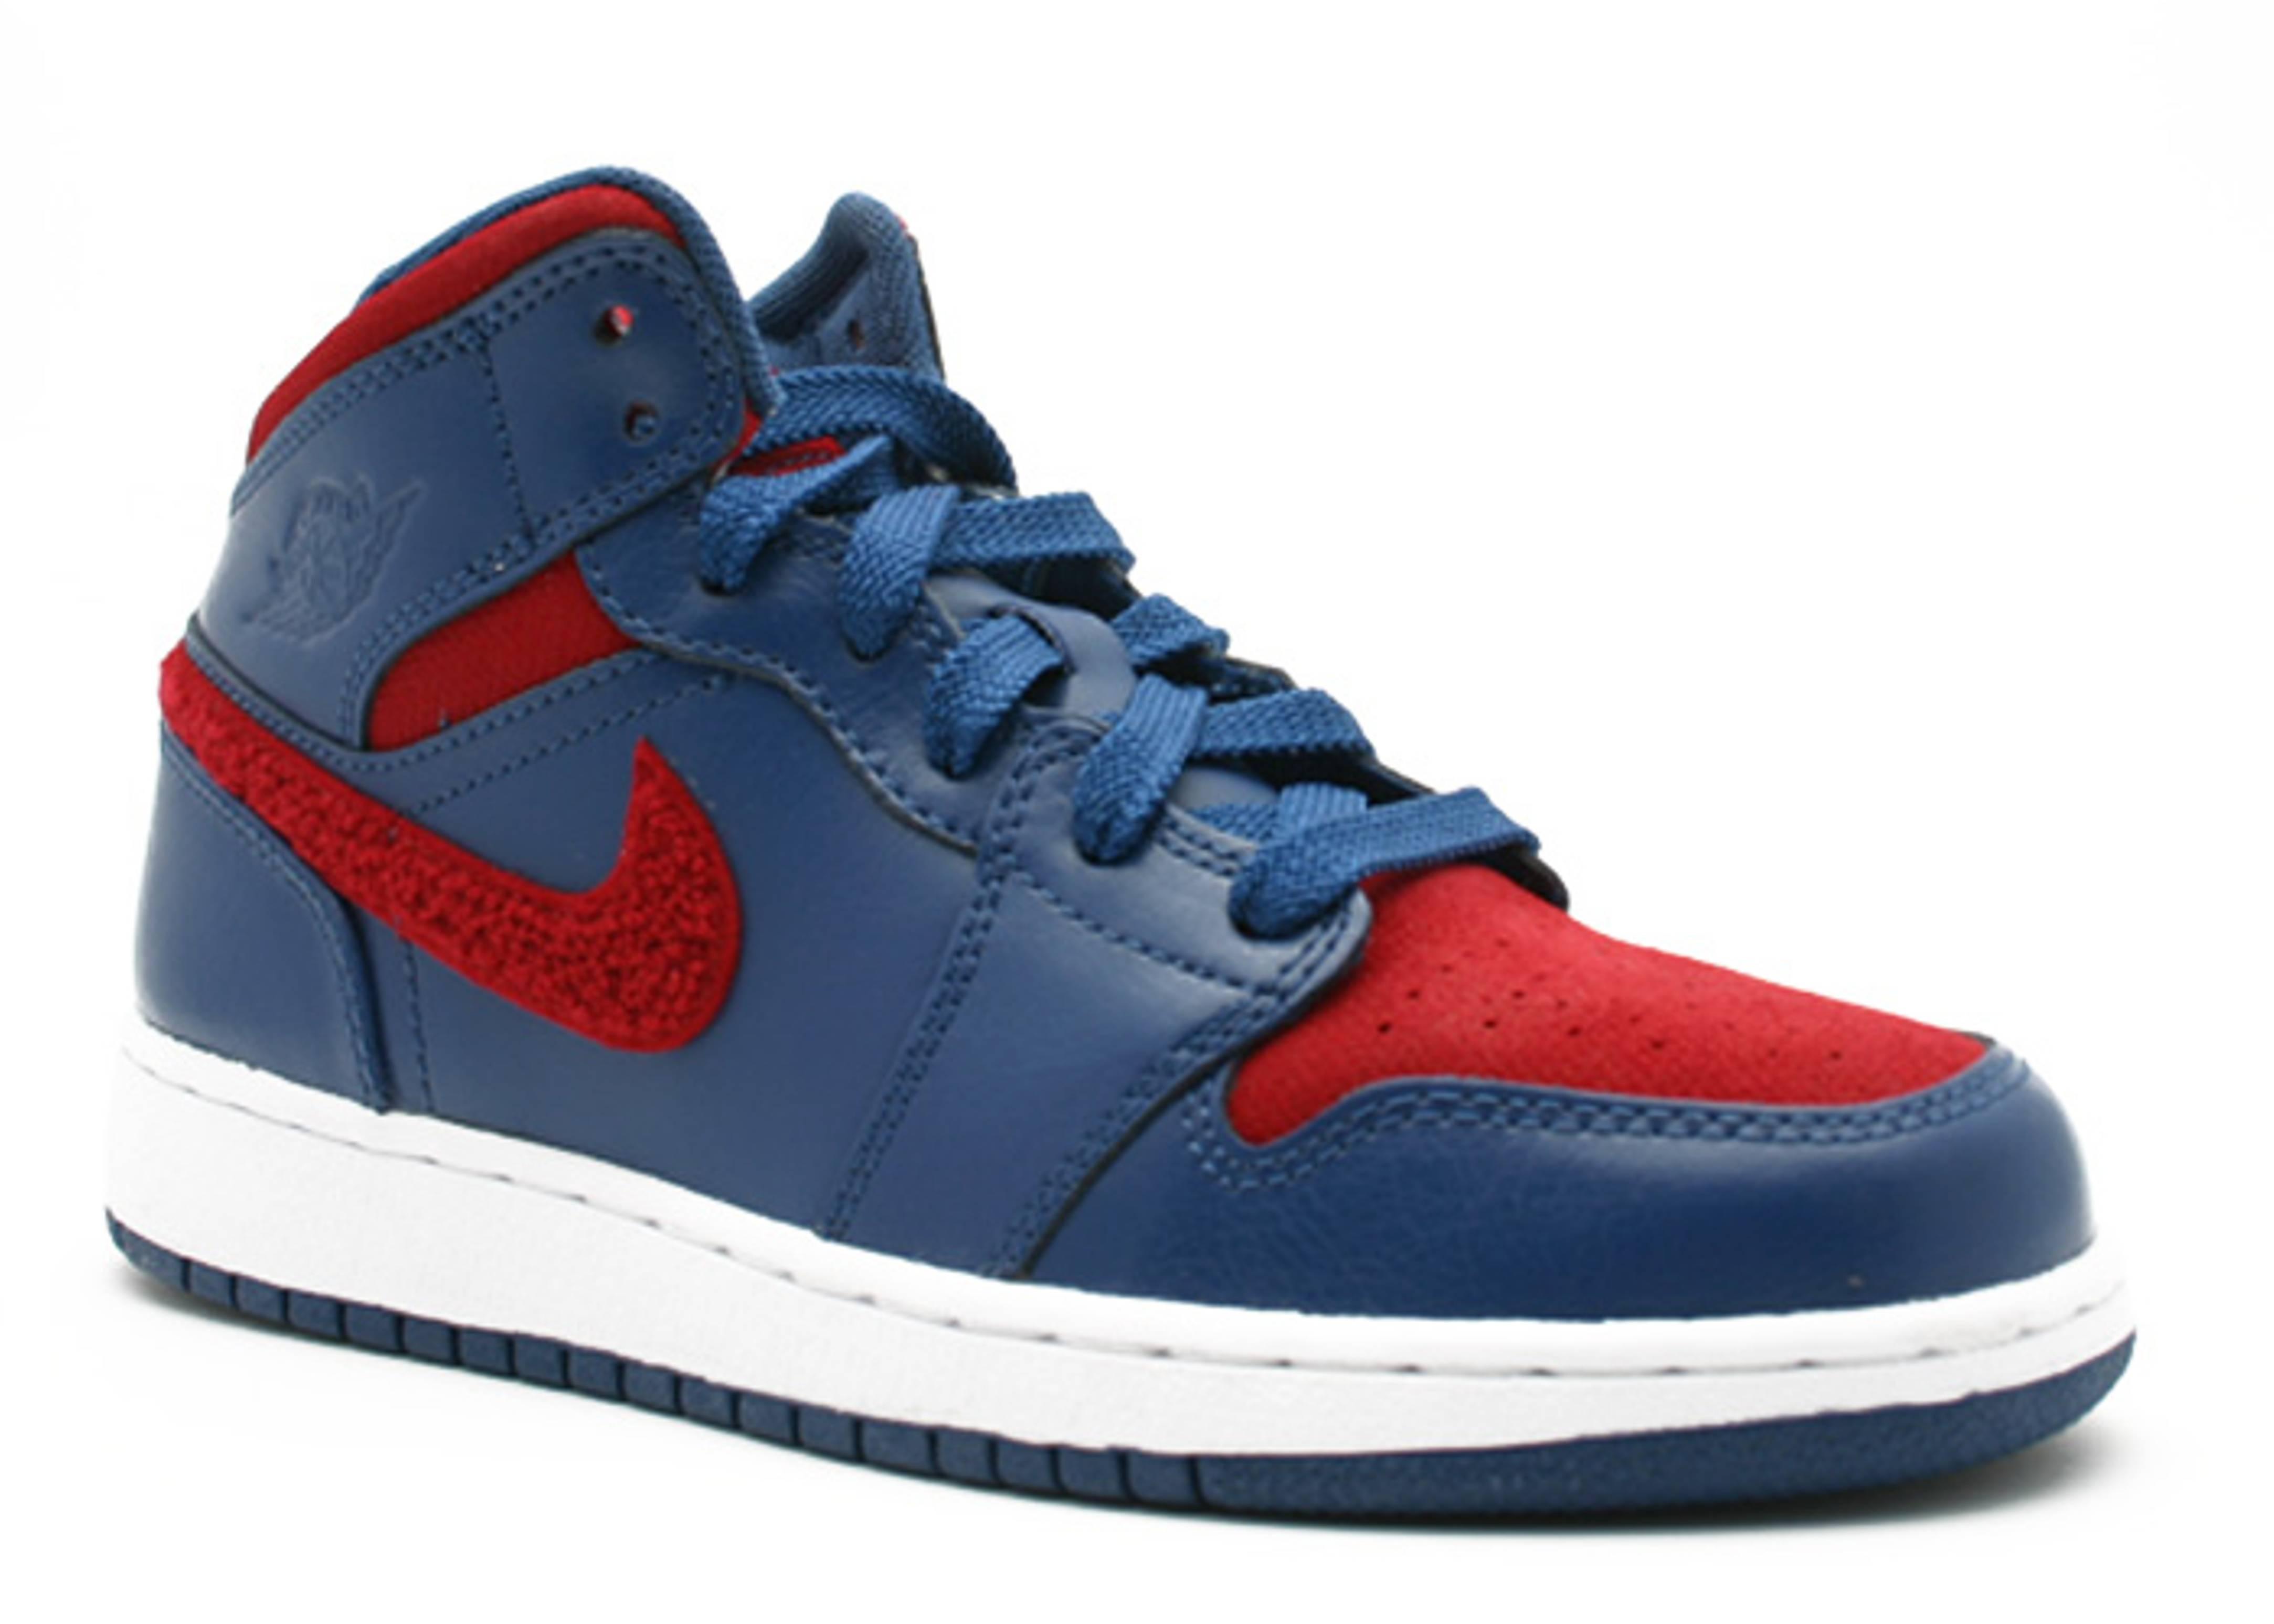 95ad951dd440 Aj 1 Retro Phat Premier (gs) - Jordan - 375174 461 - french blue varisty  red white